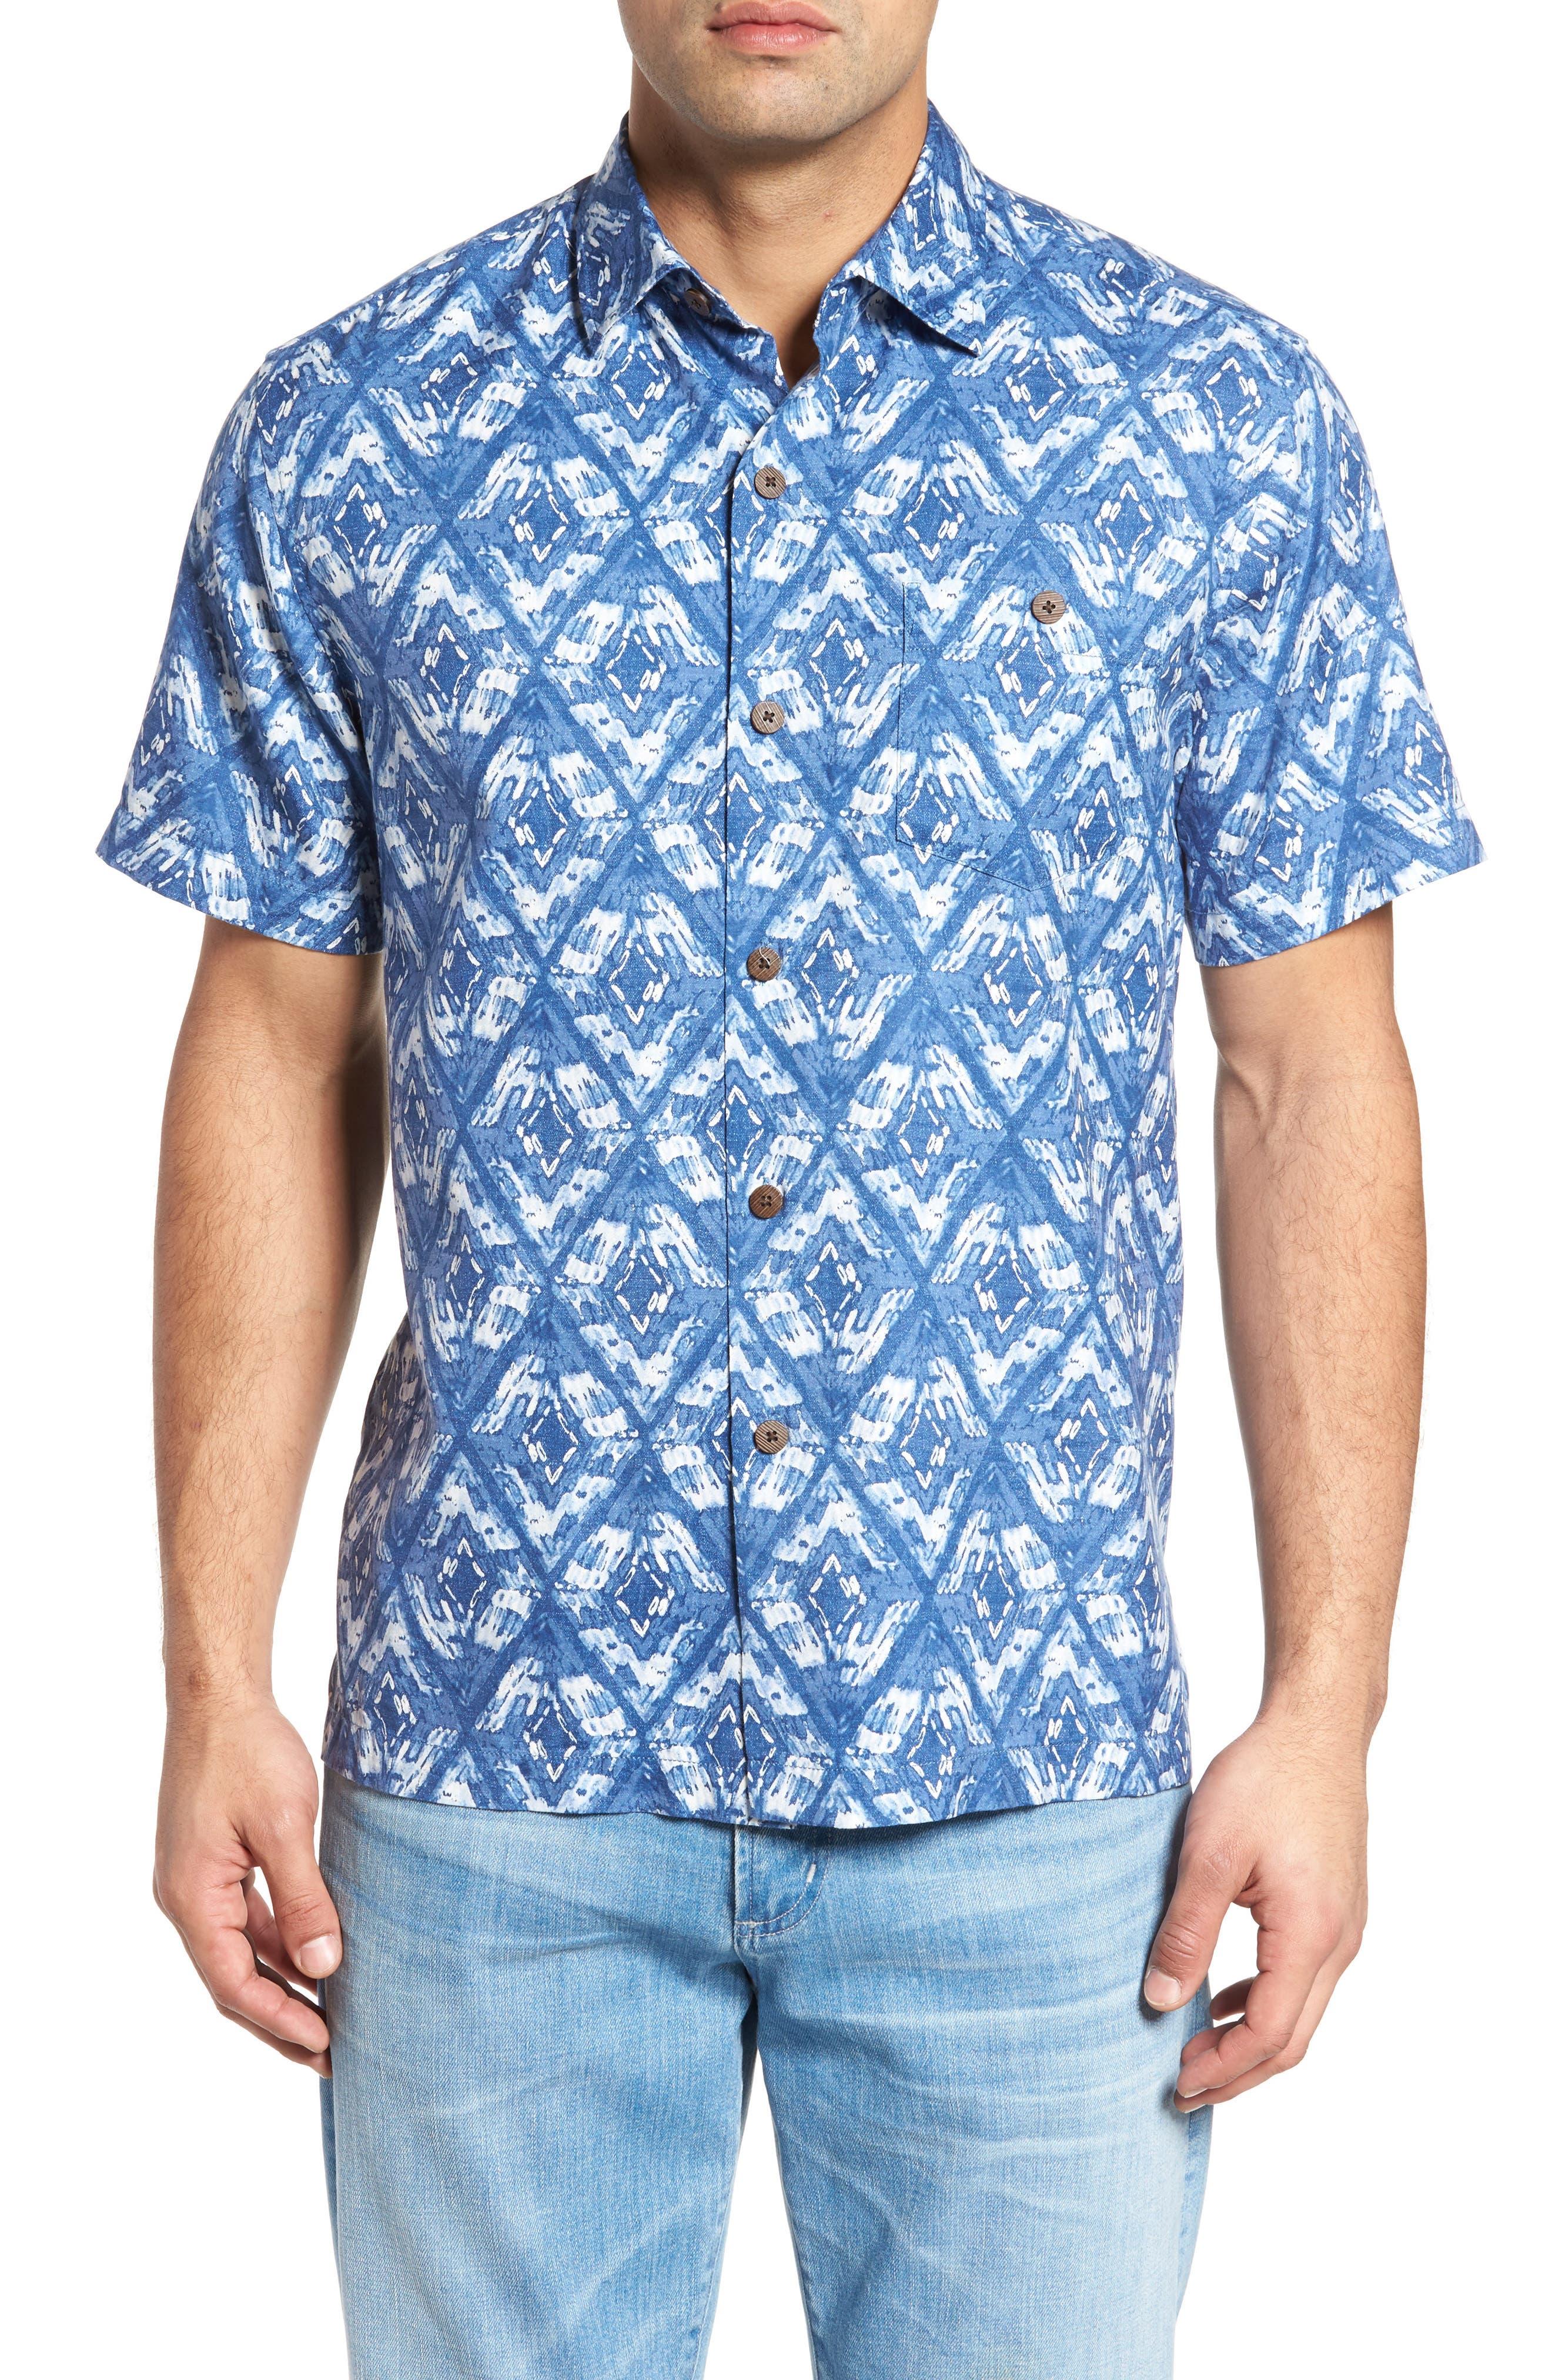 Alternate Image 1 Selected - Tommy Bahama Deep Water Diamond Camp Shirt